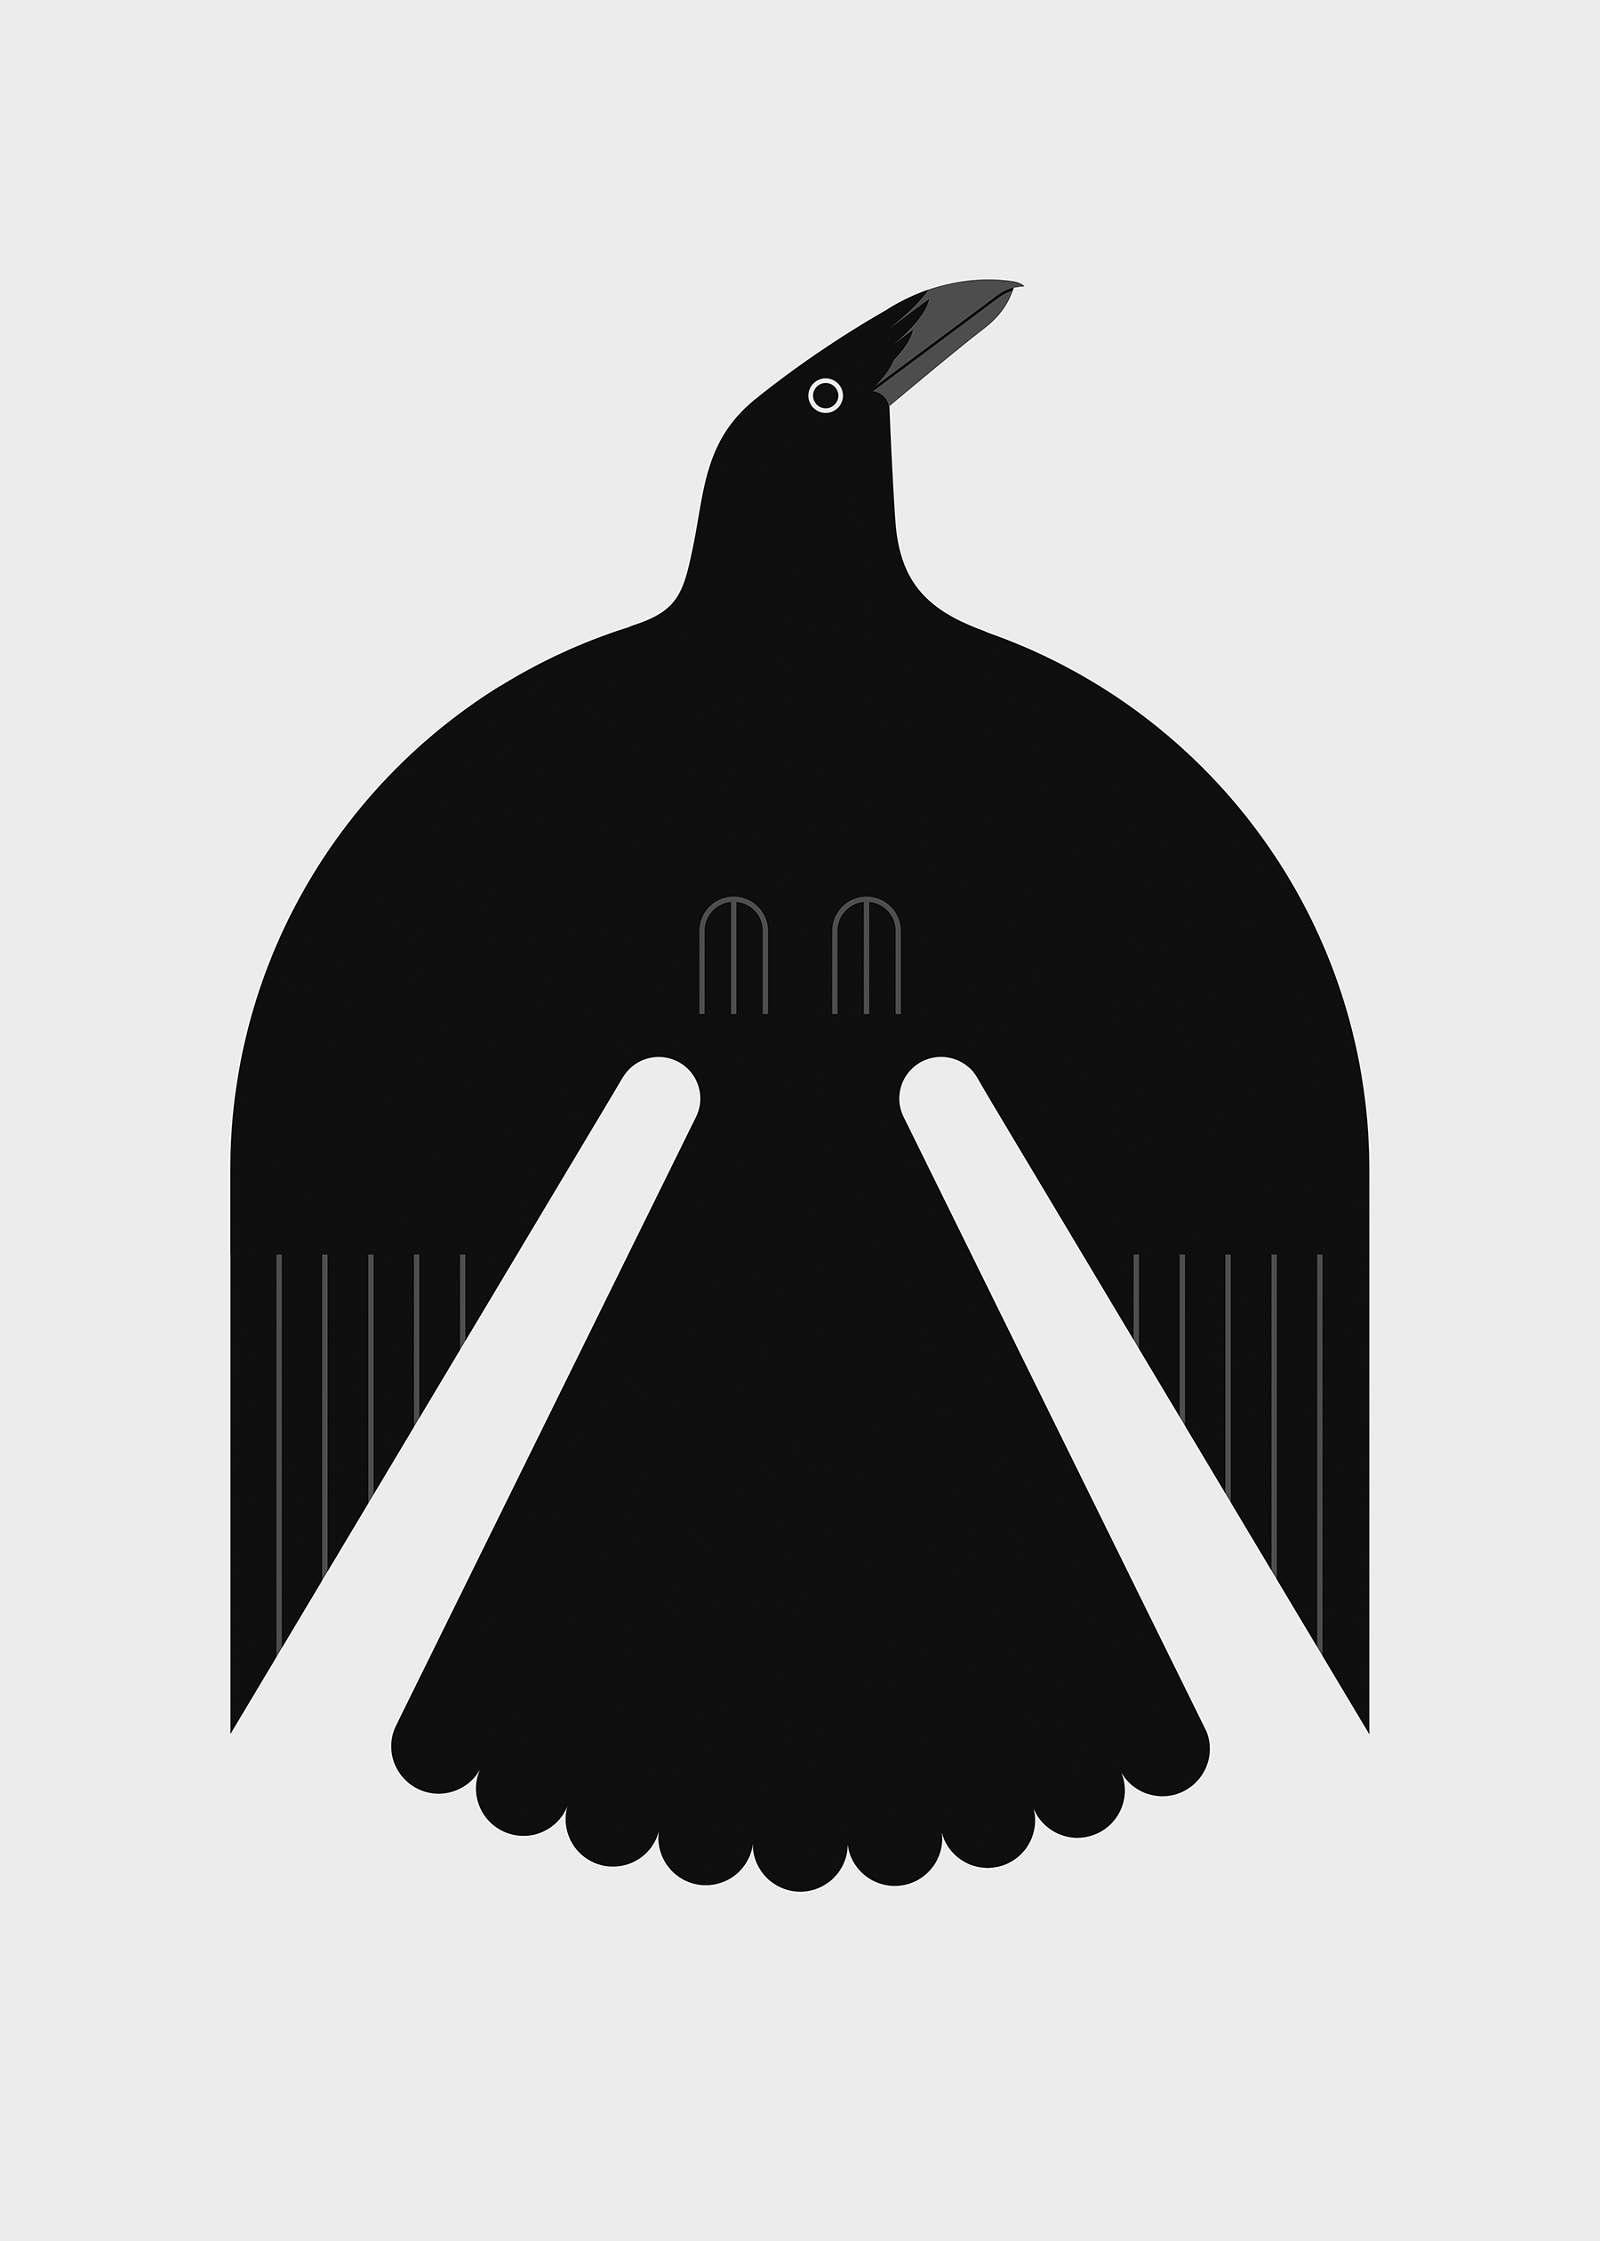 Crow-Game-of-Thrones-Animal-Bird-Illustration-Owen-Davey_1600_c.jpg